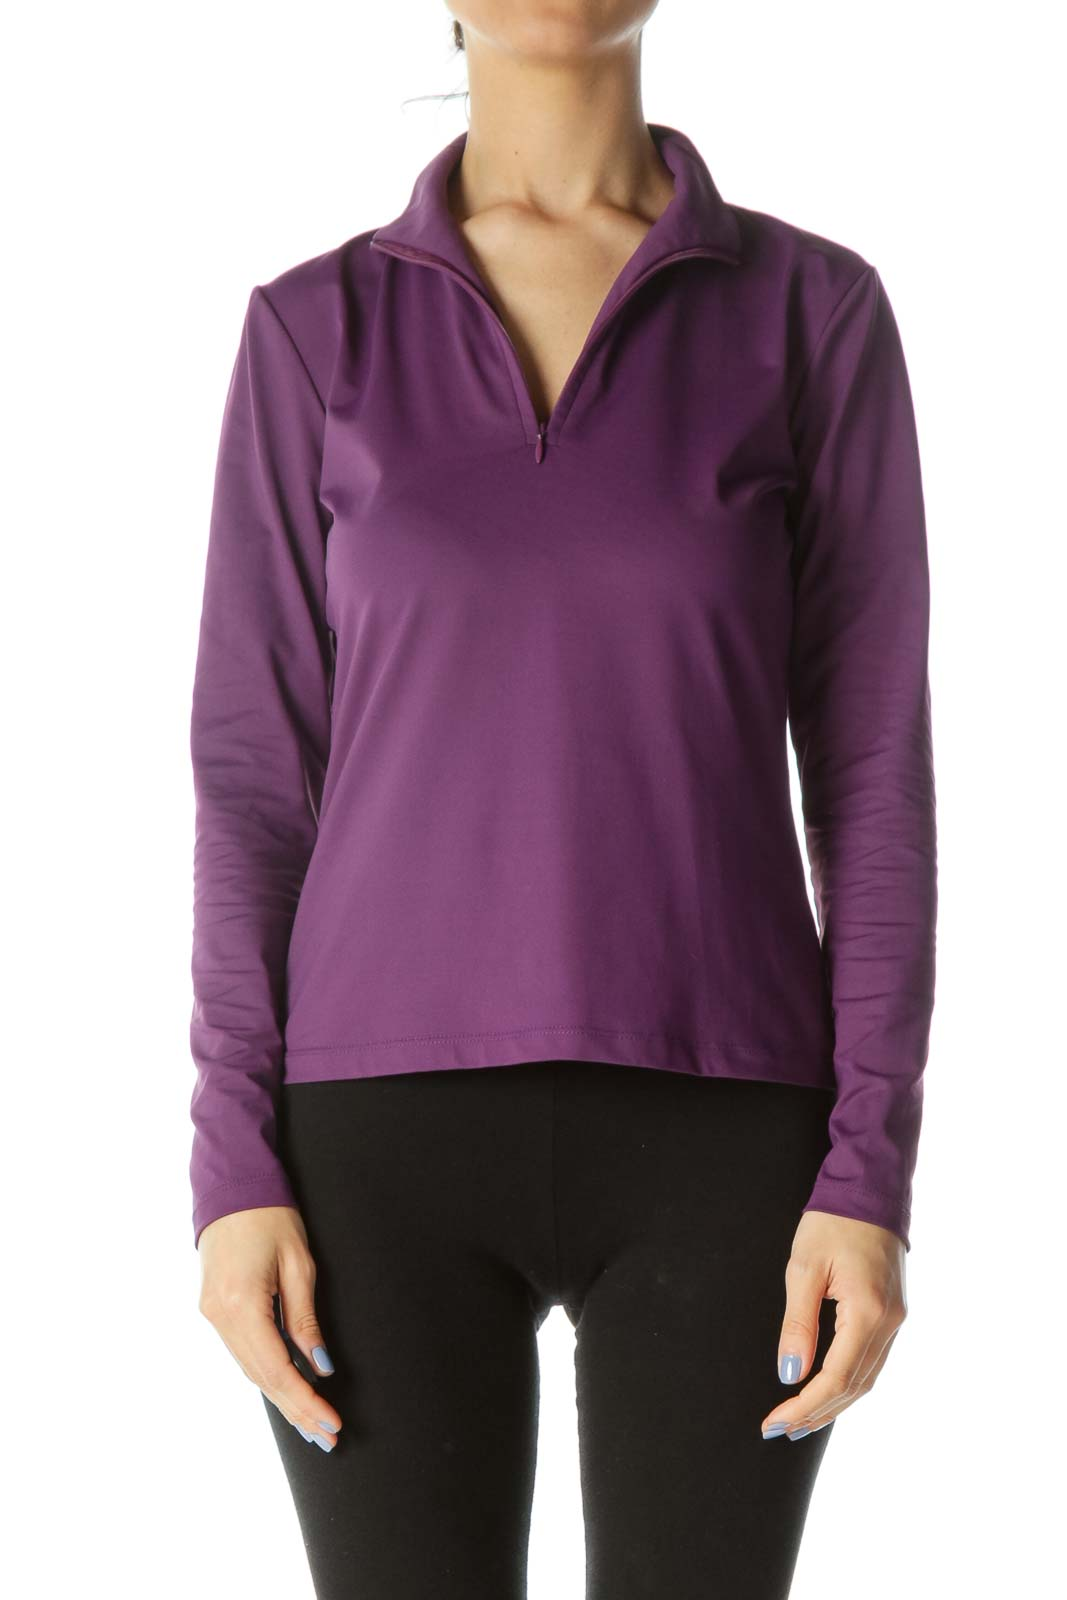 Purple Zipper Long-Sleeve Stretch Activewear Jacket Front